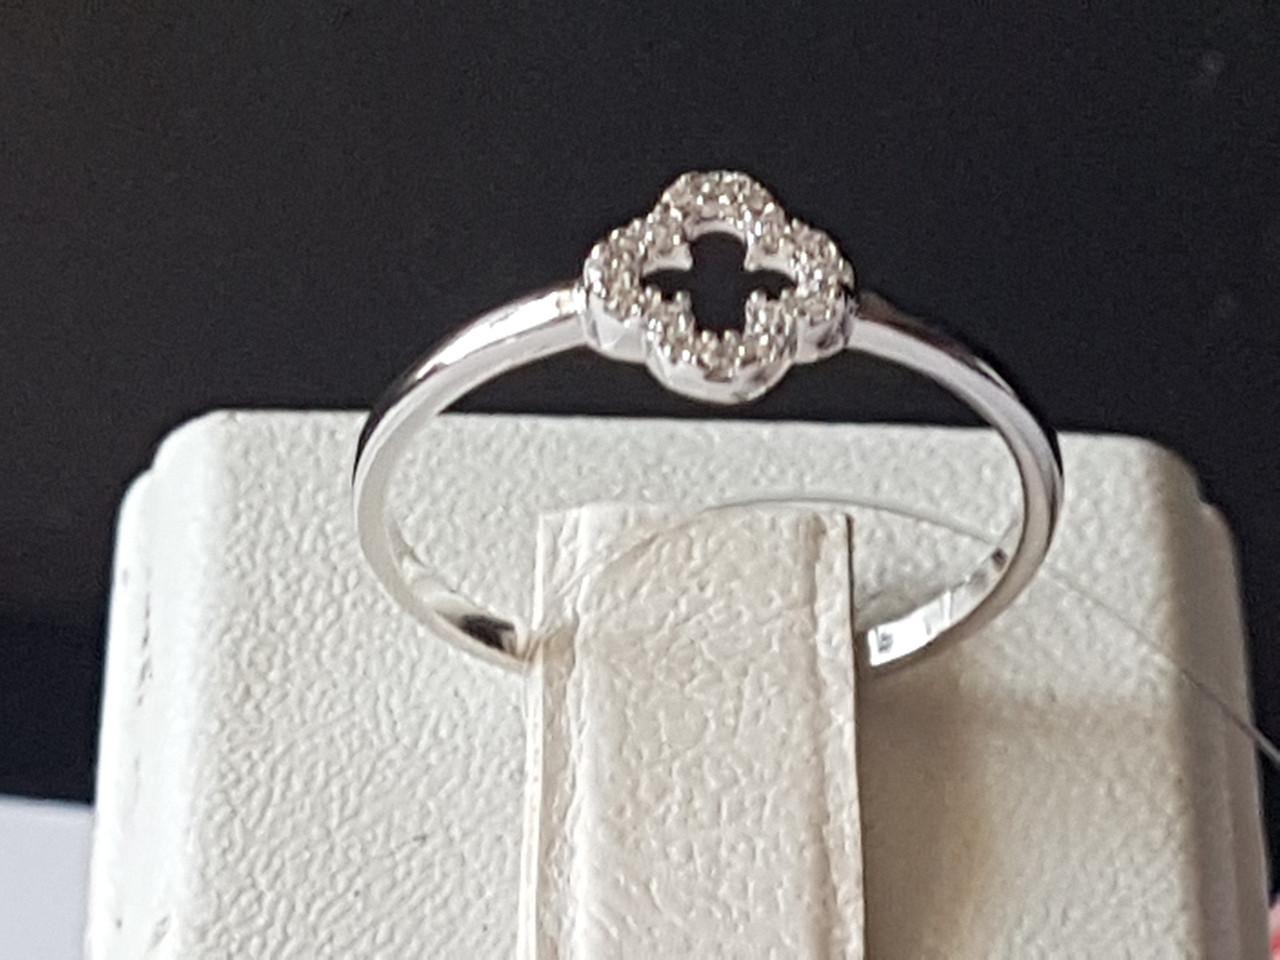 Серебряное кольцо с фианитами. Артикул 901-00871 15